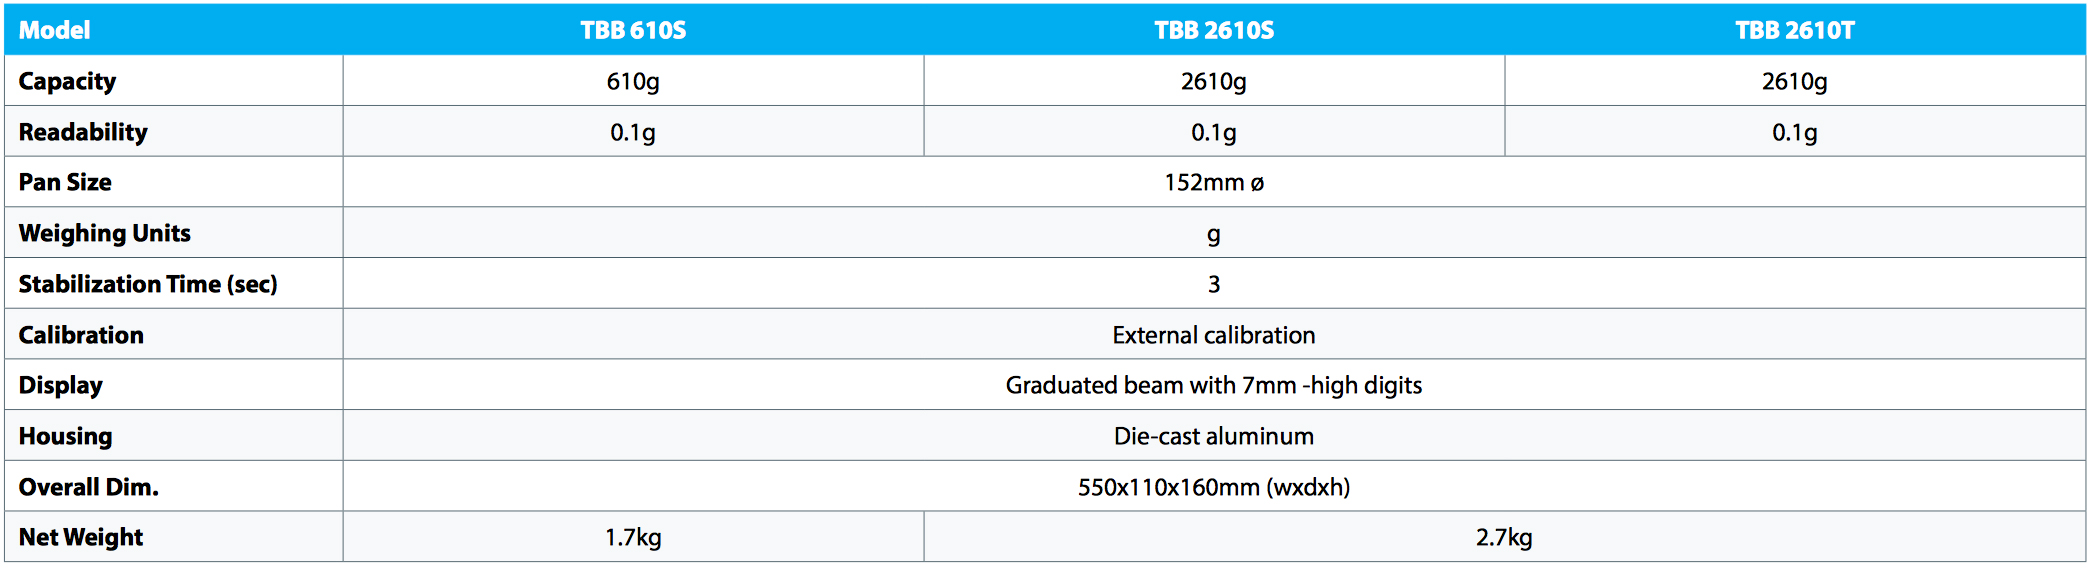 ohaus triple beam balance 2610g manual